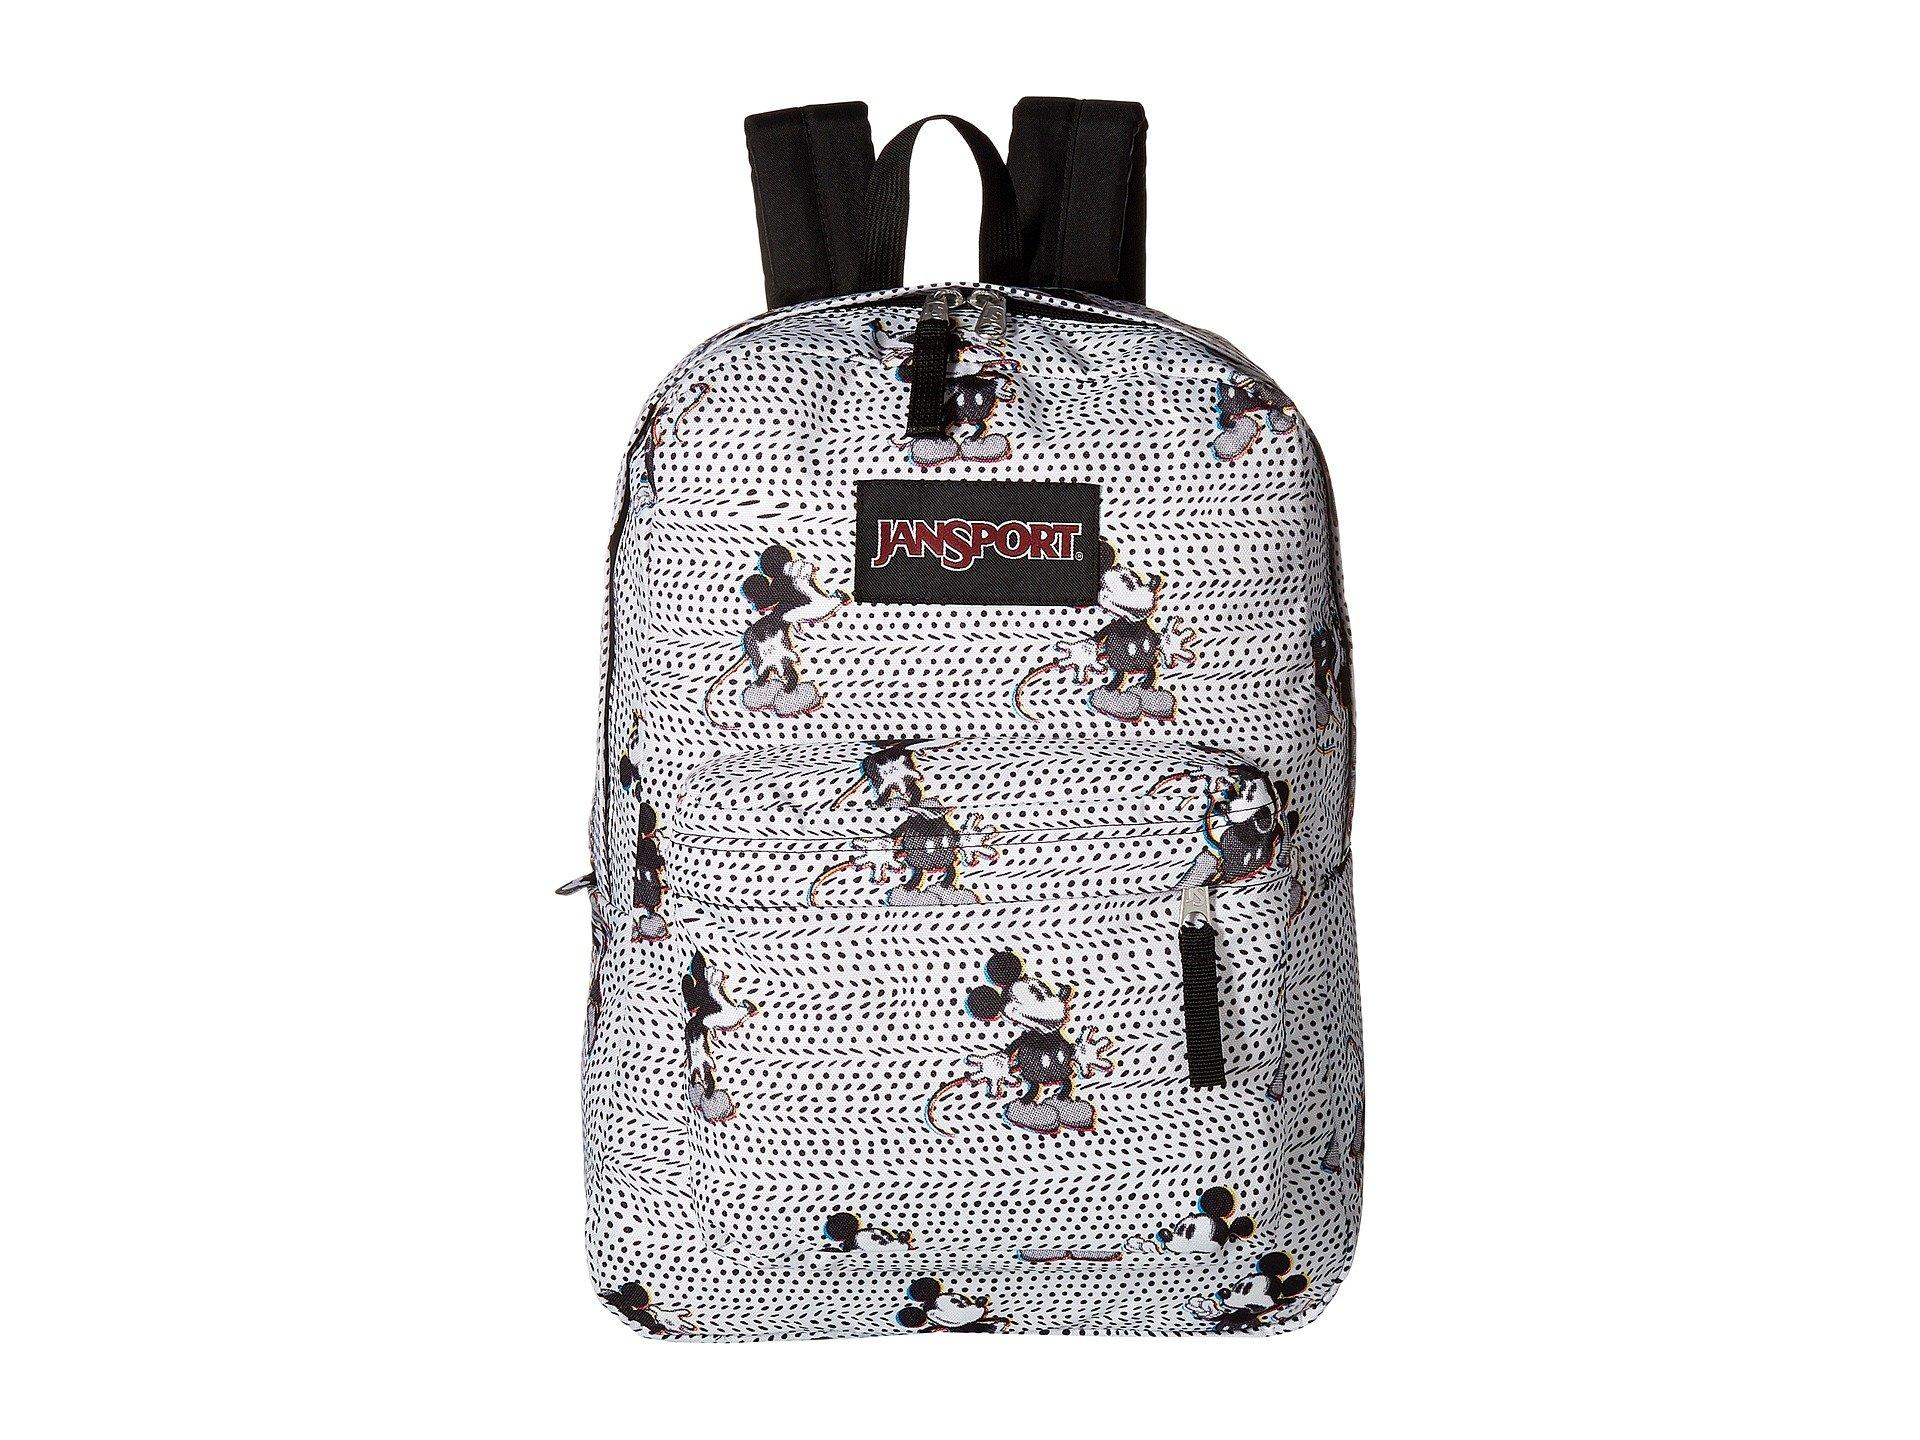 0258c1190eac Jansport Disney Backpack Singapore